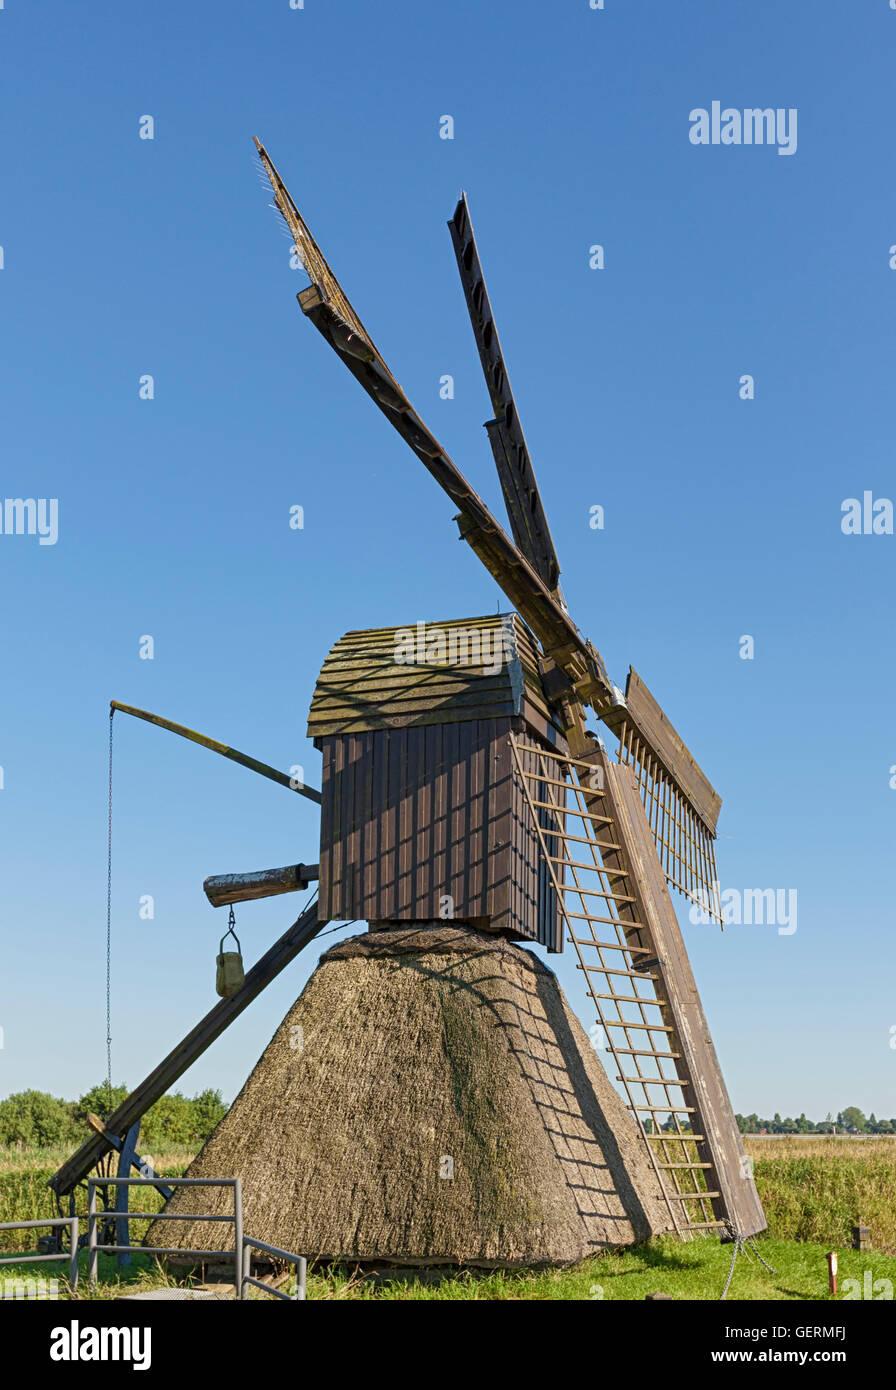 Historic scoop mill at Honigfleth, near Wilster, Schleswig-Holstein - Stock Image